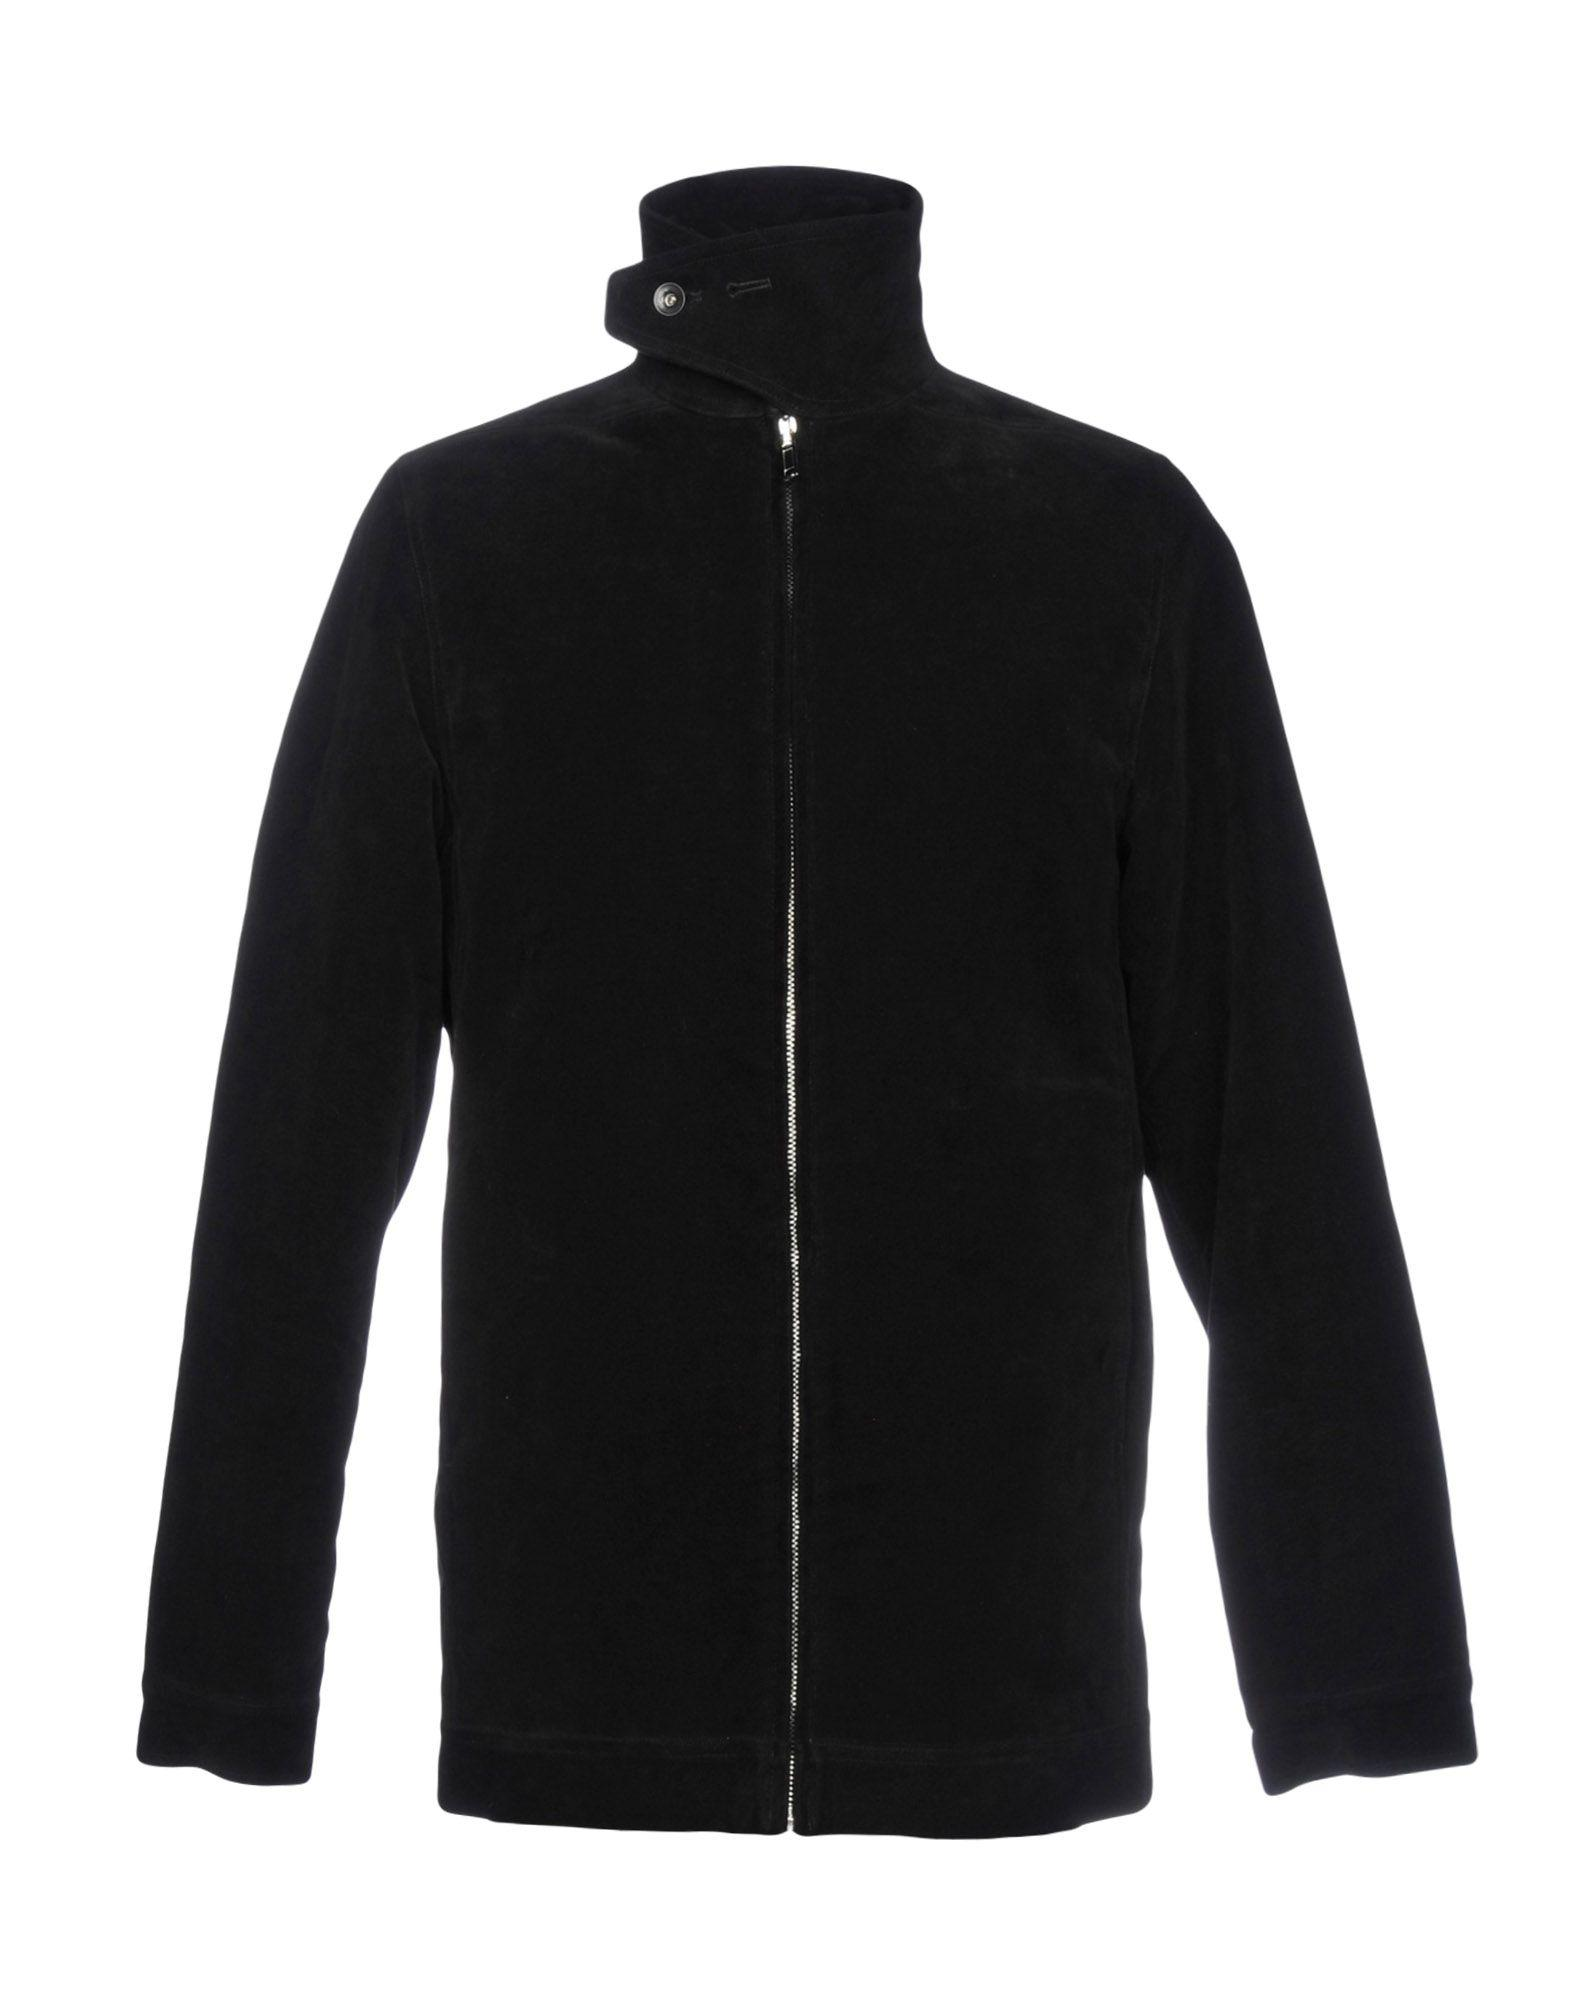 Rick Owens Drkshdw Jackets In Black